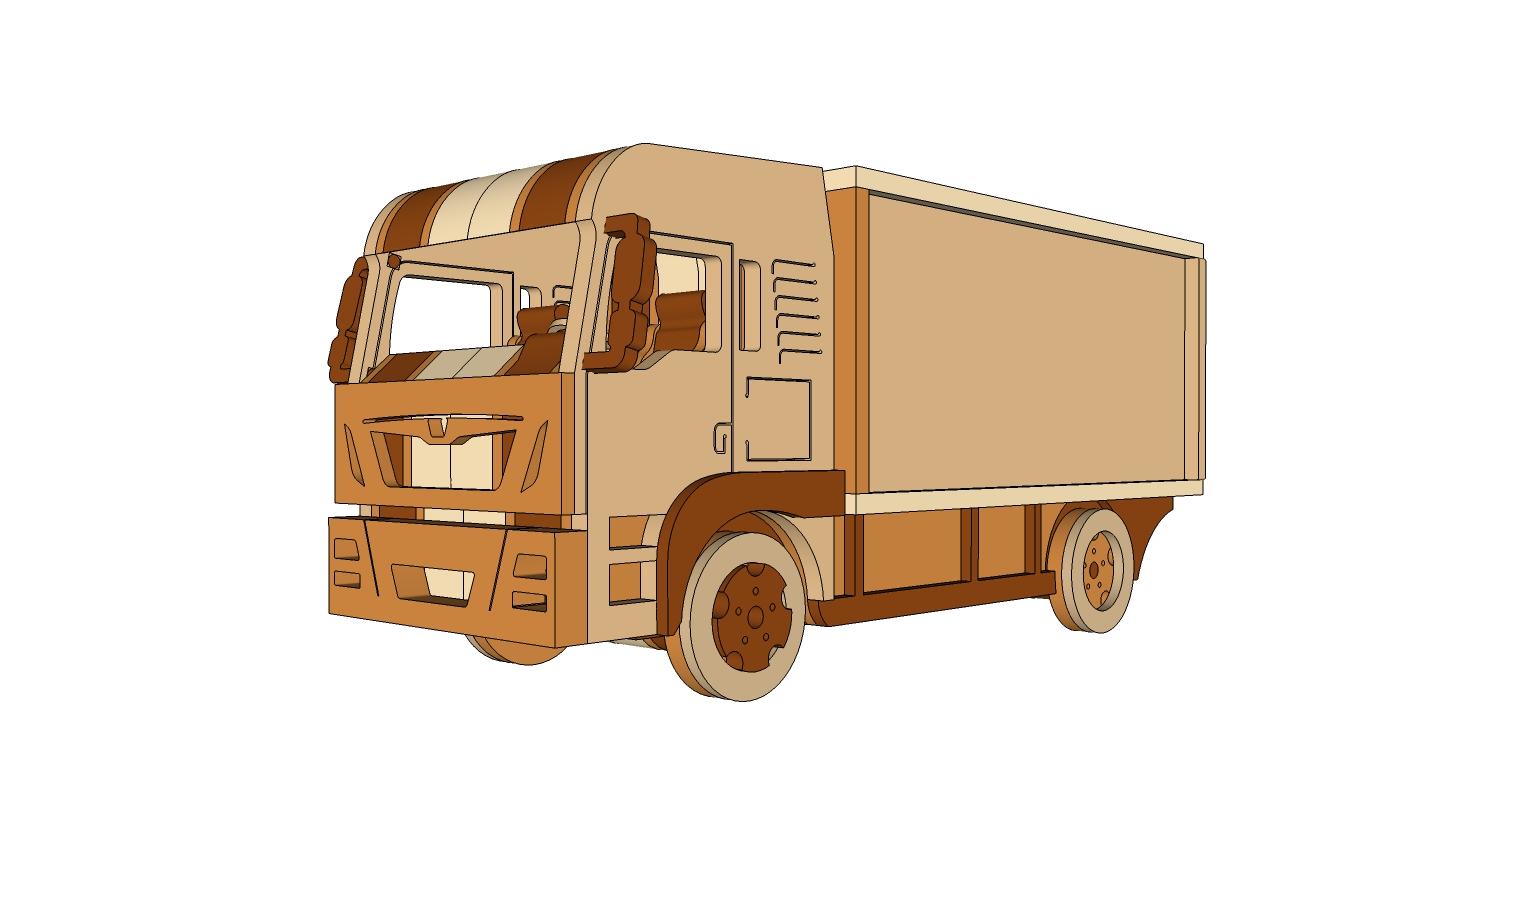 man 12 ton truck plans dm idea. Black Bedroom Furniture Sets. Home Design Ideas